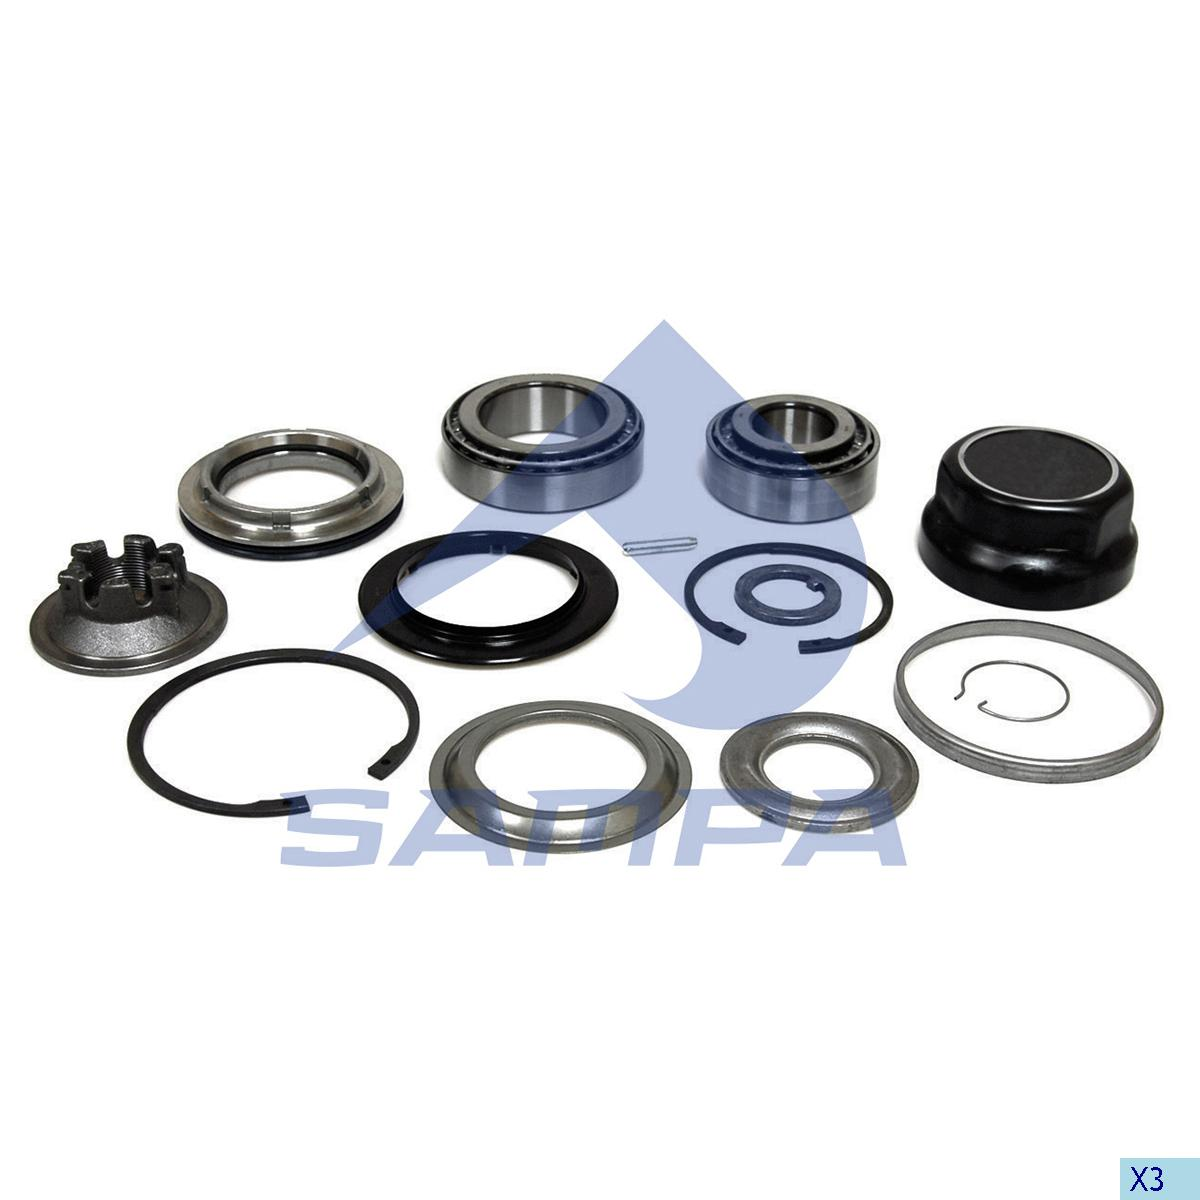 Repair Kit, Wheel Hub, Bergische, Power Unit